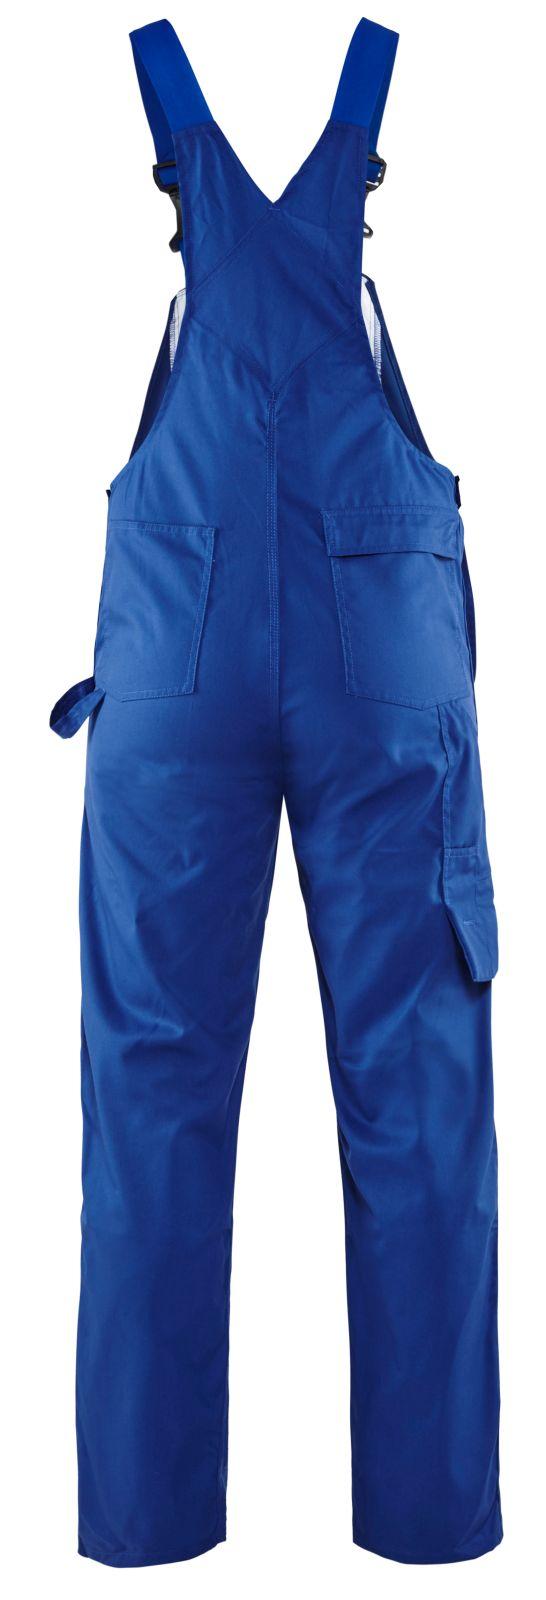 Blaklader Amerikaanse overalls 26101800 korenblauw(8500)